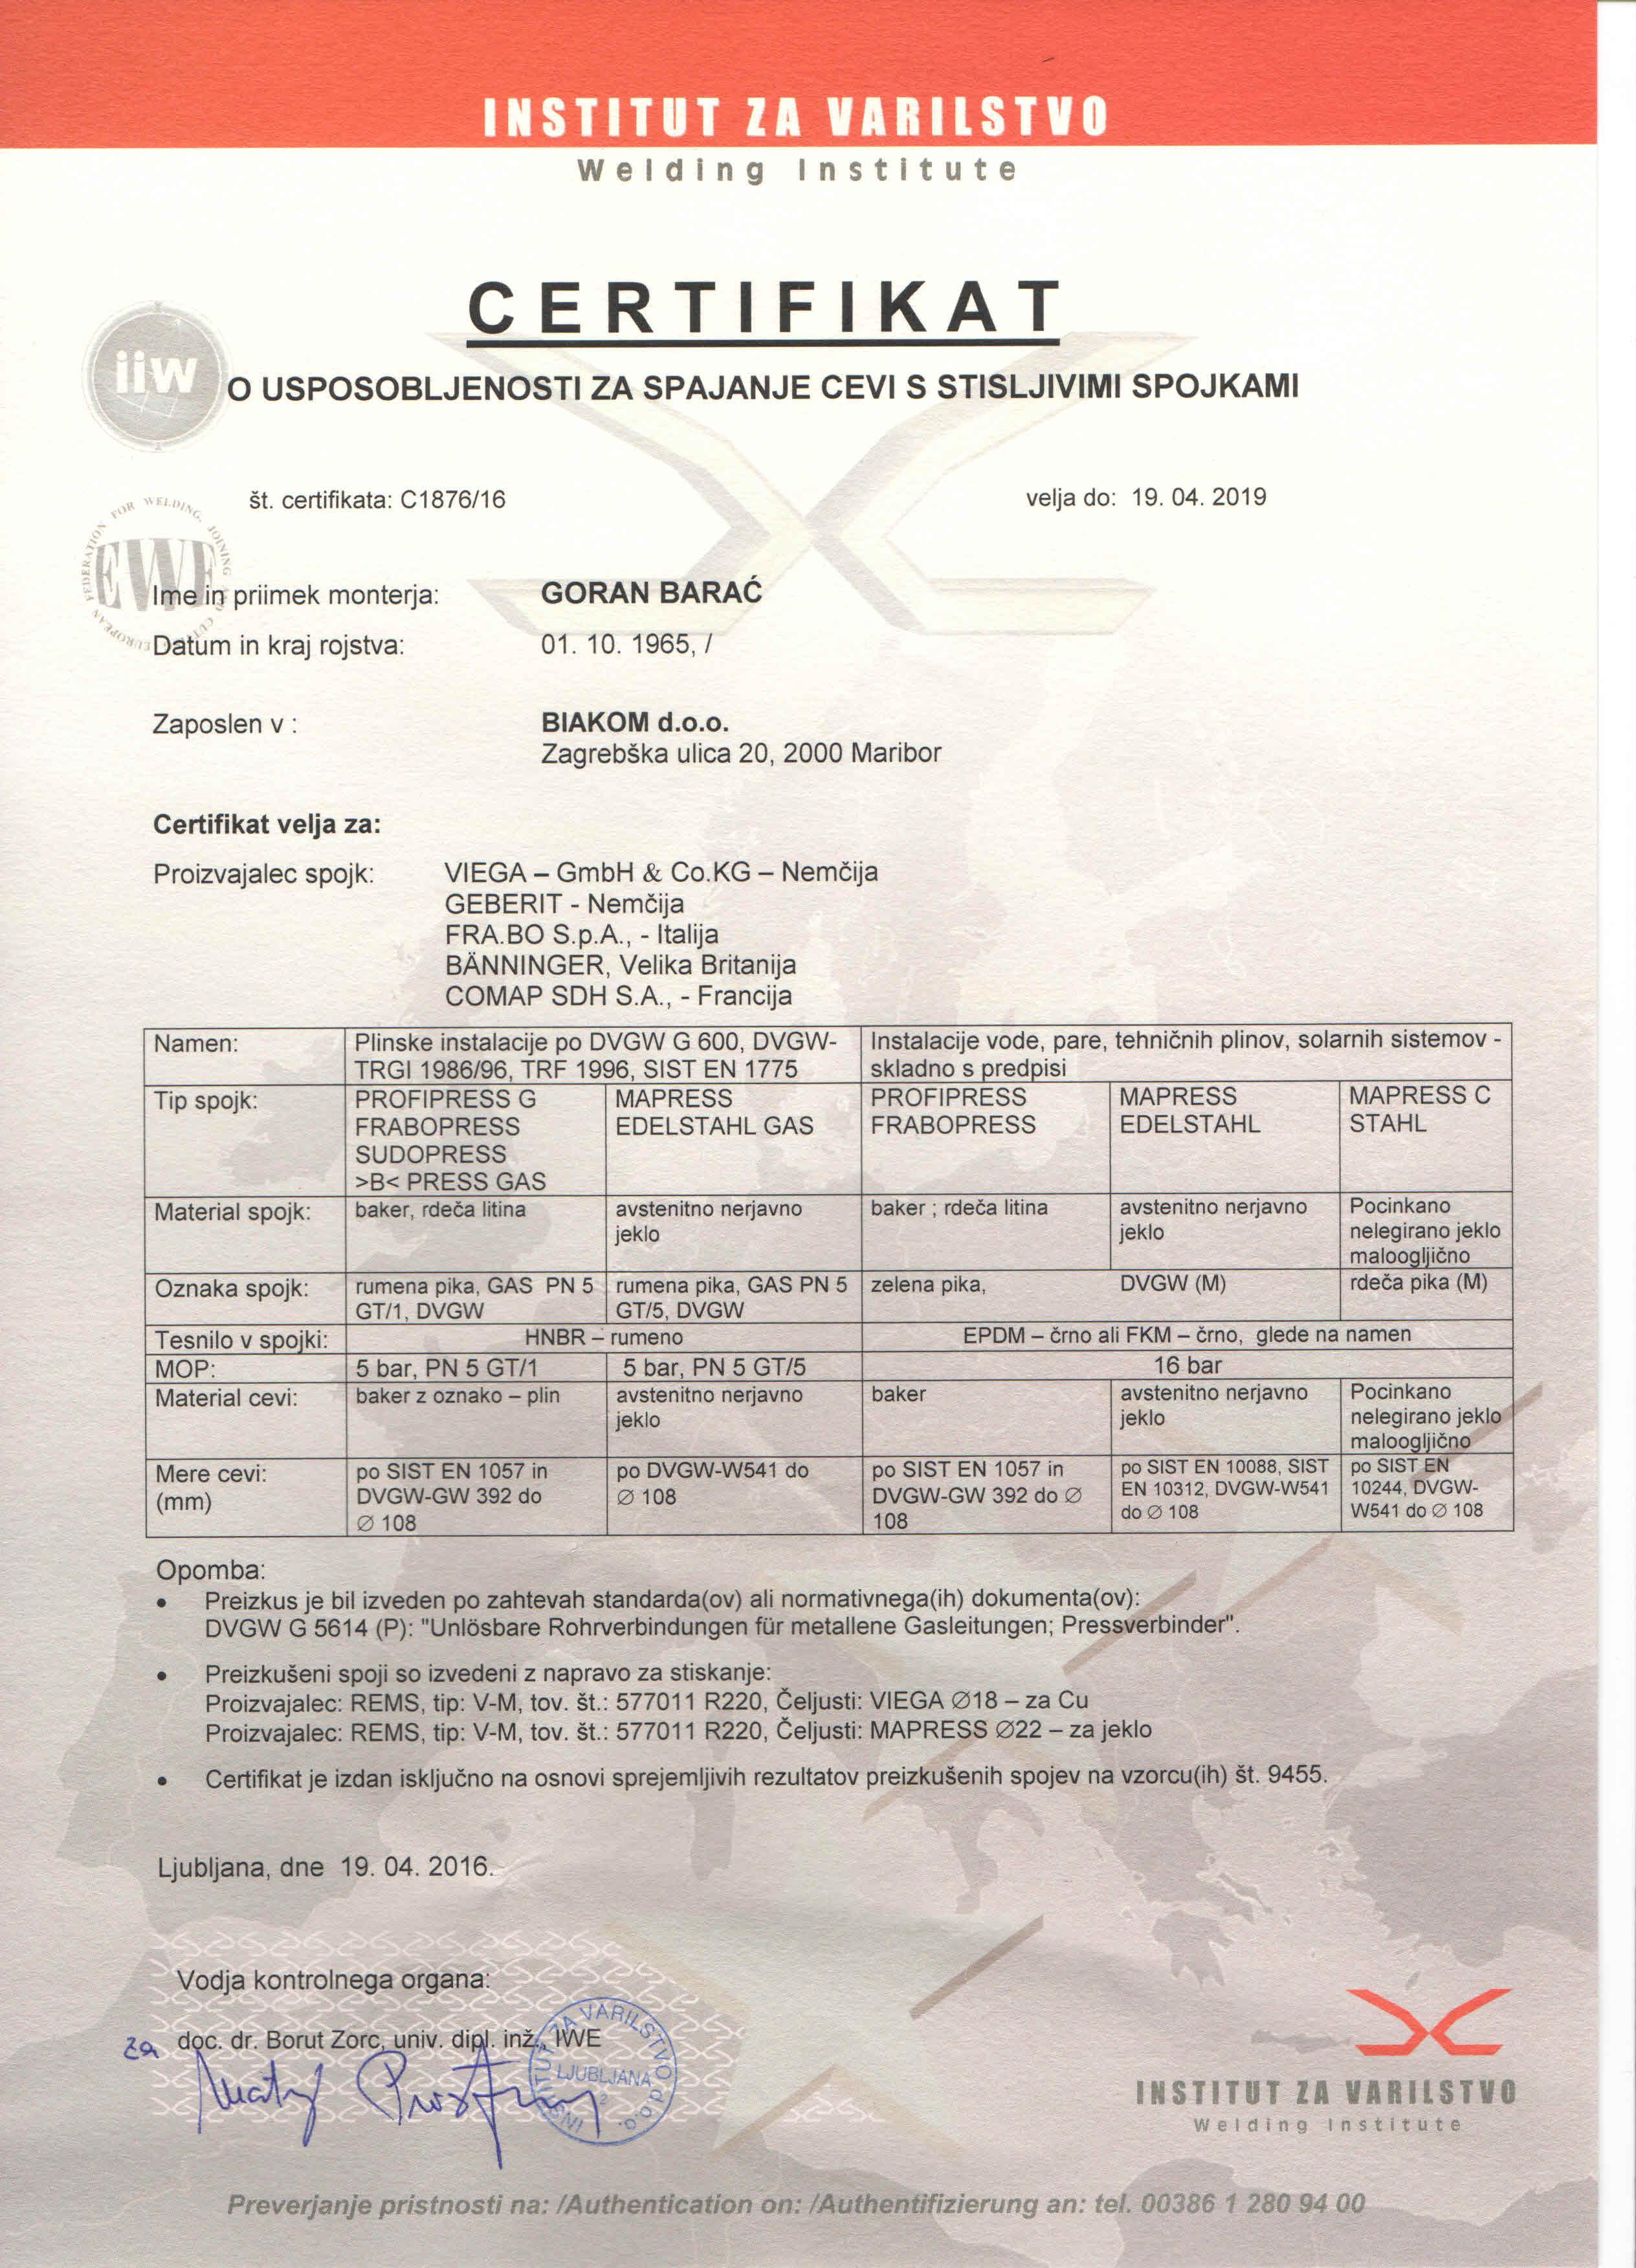 Certifikat za spajanje cevi s stisljivimi spojkami